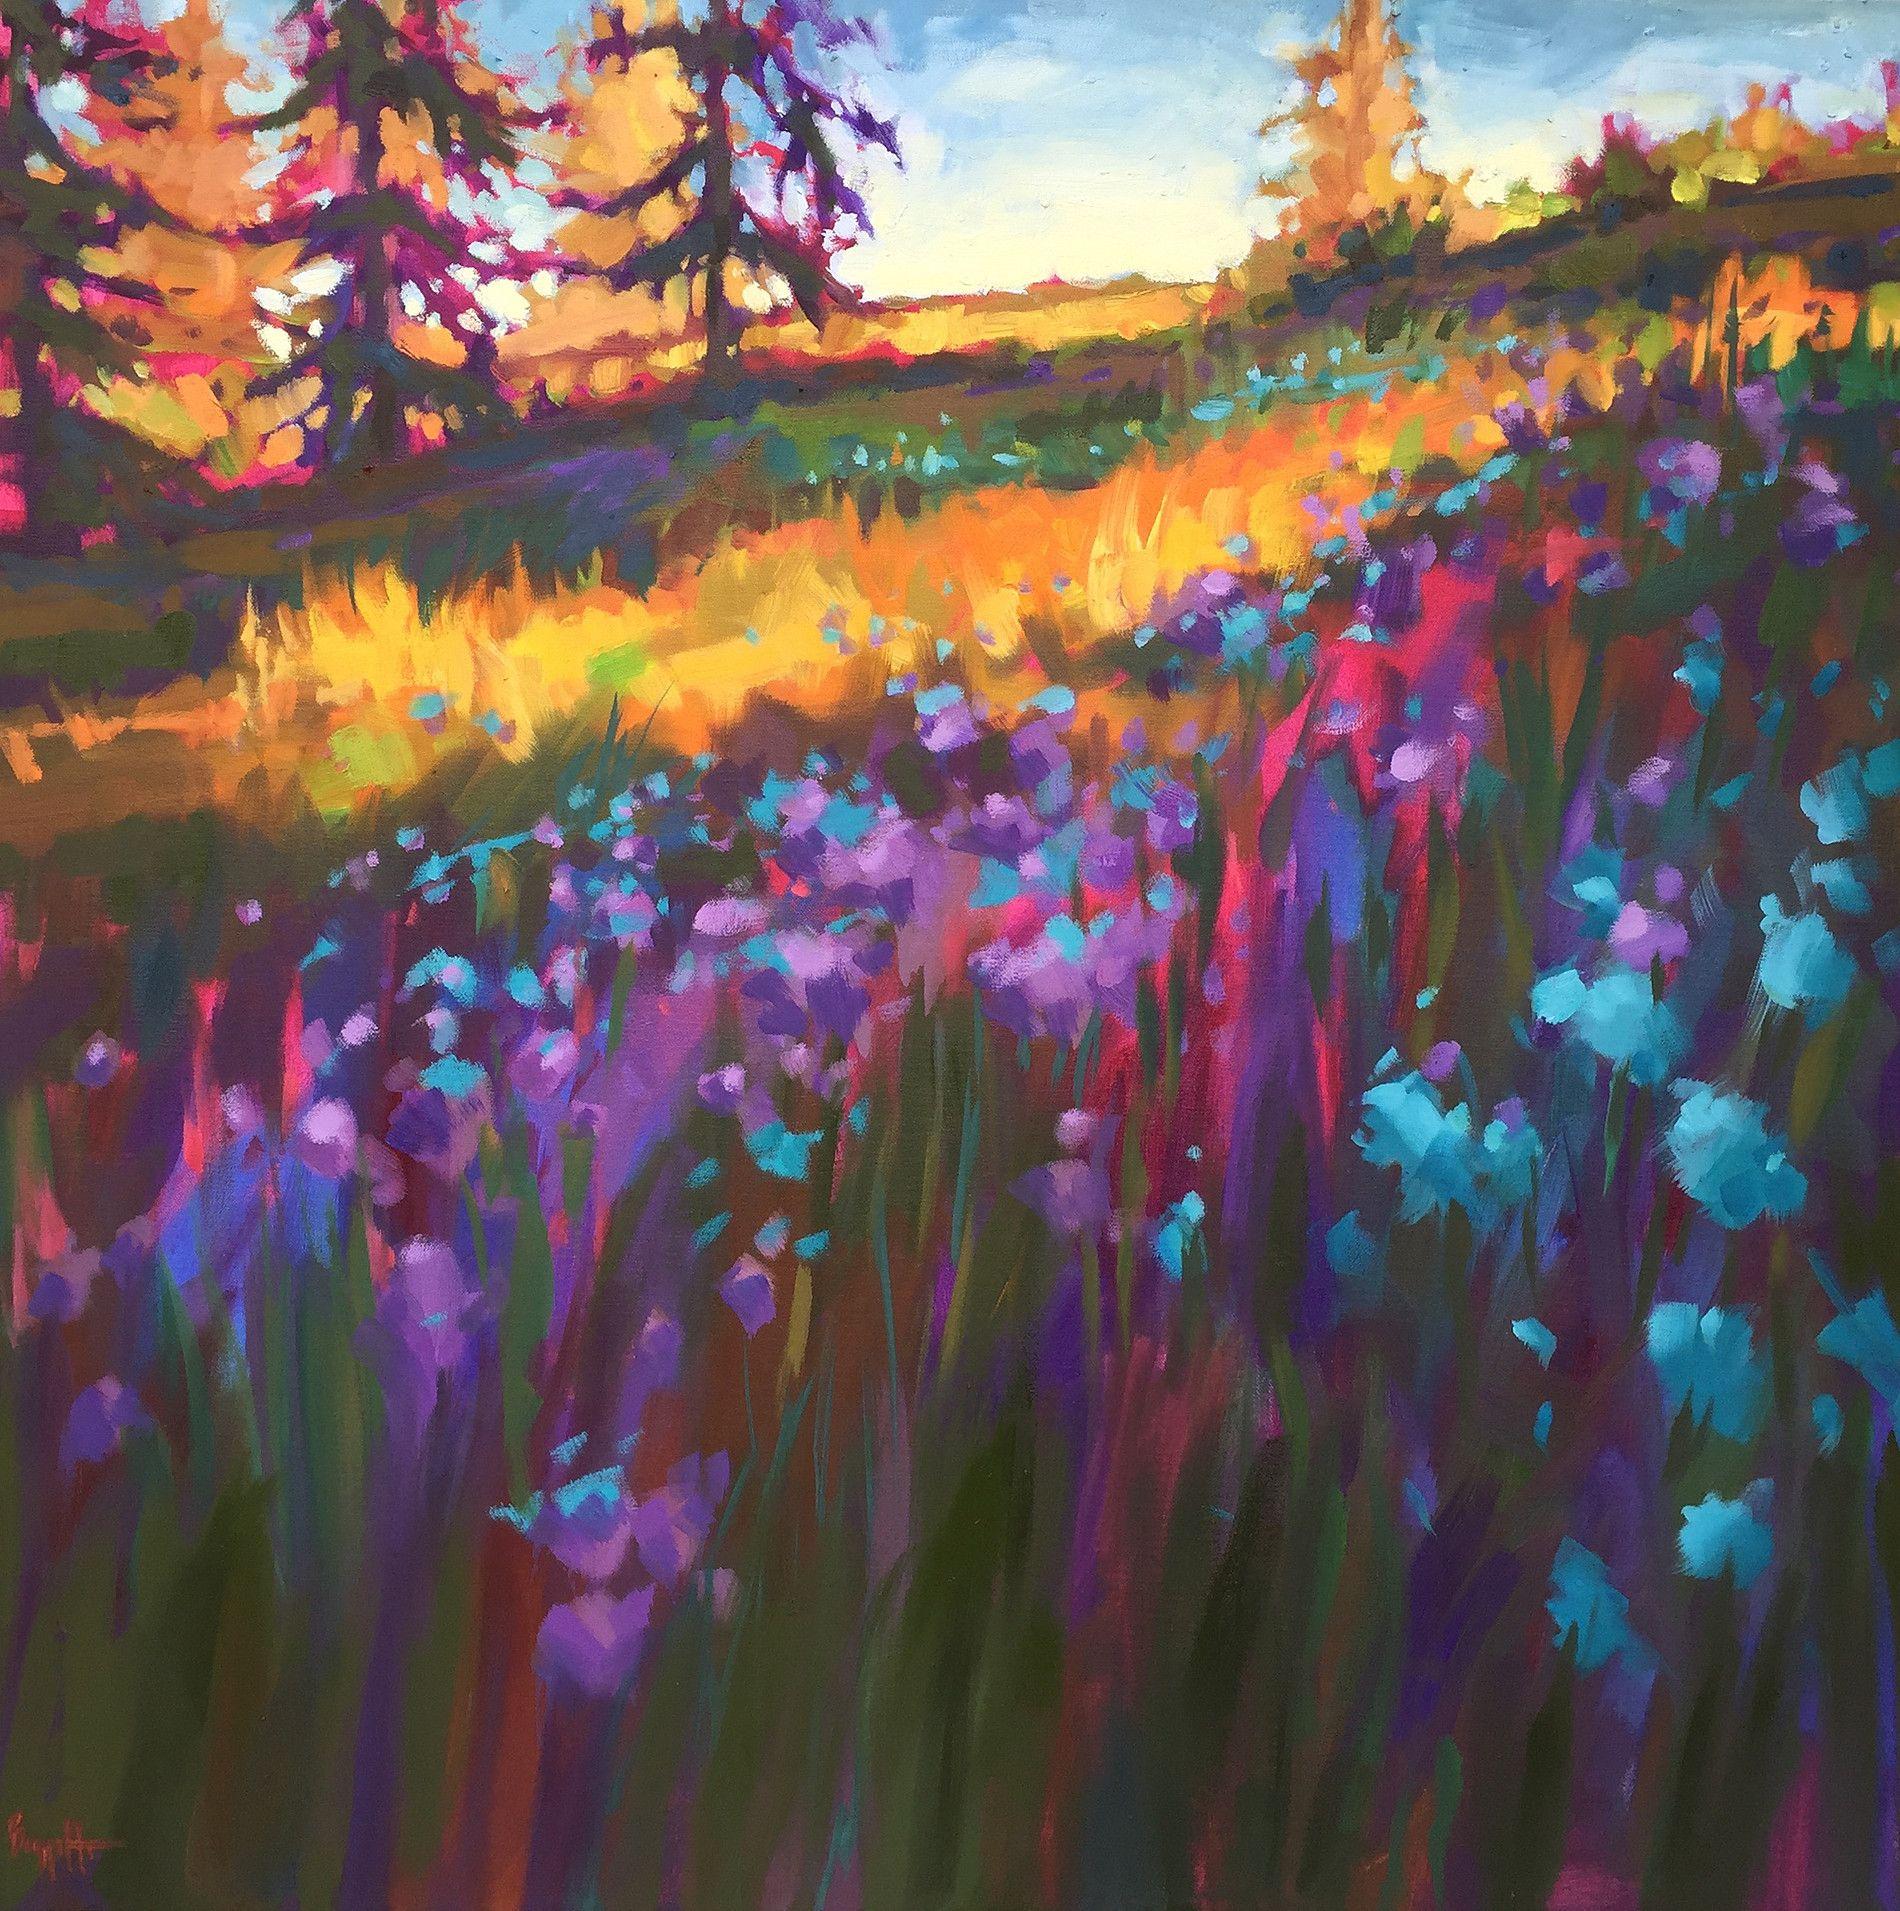 SpringStory_36x36_oil.jpg   Oil pastel landscape, Oil pastel ...